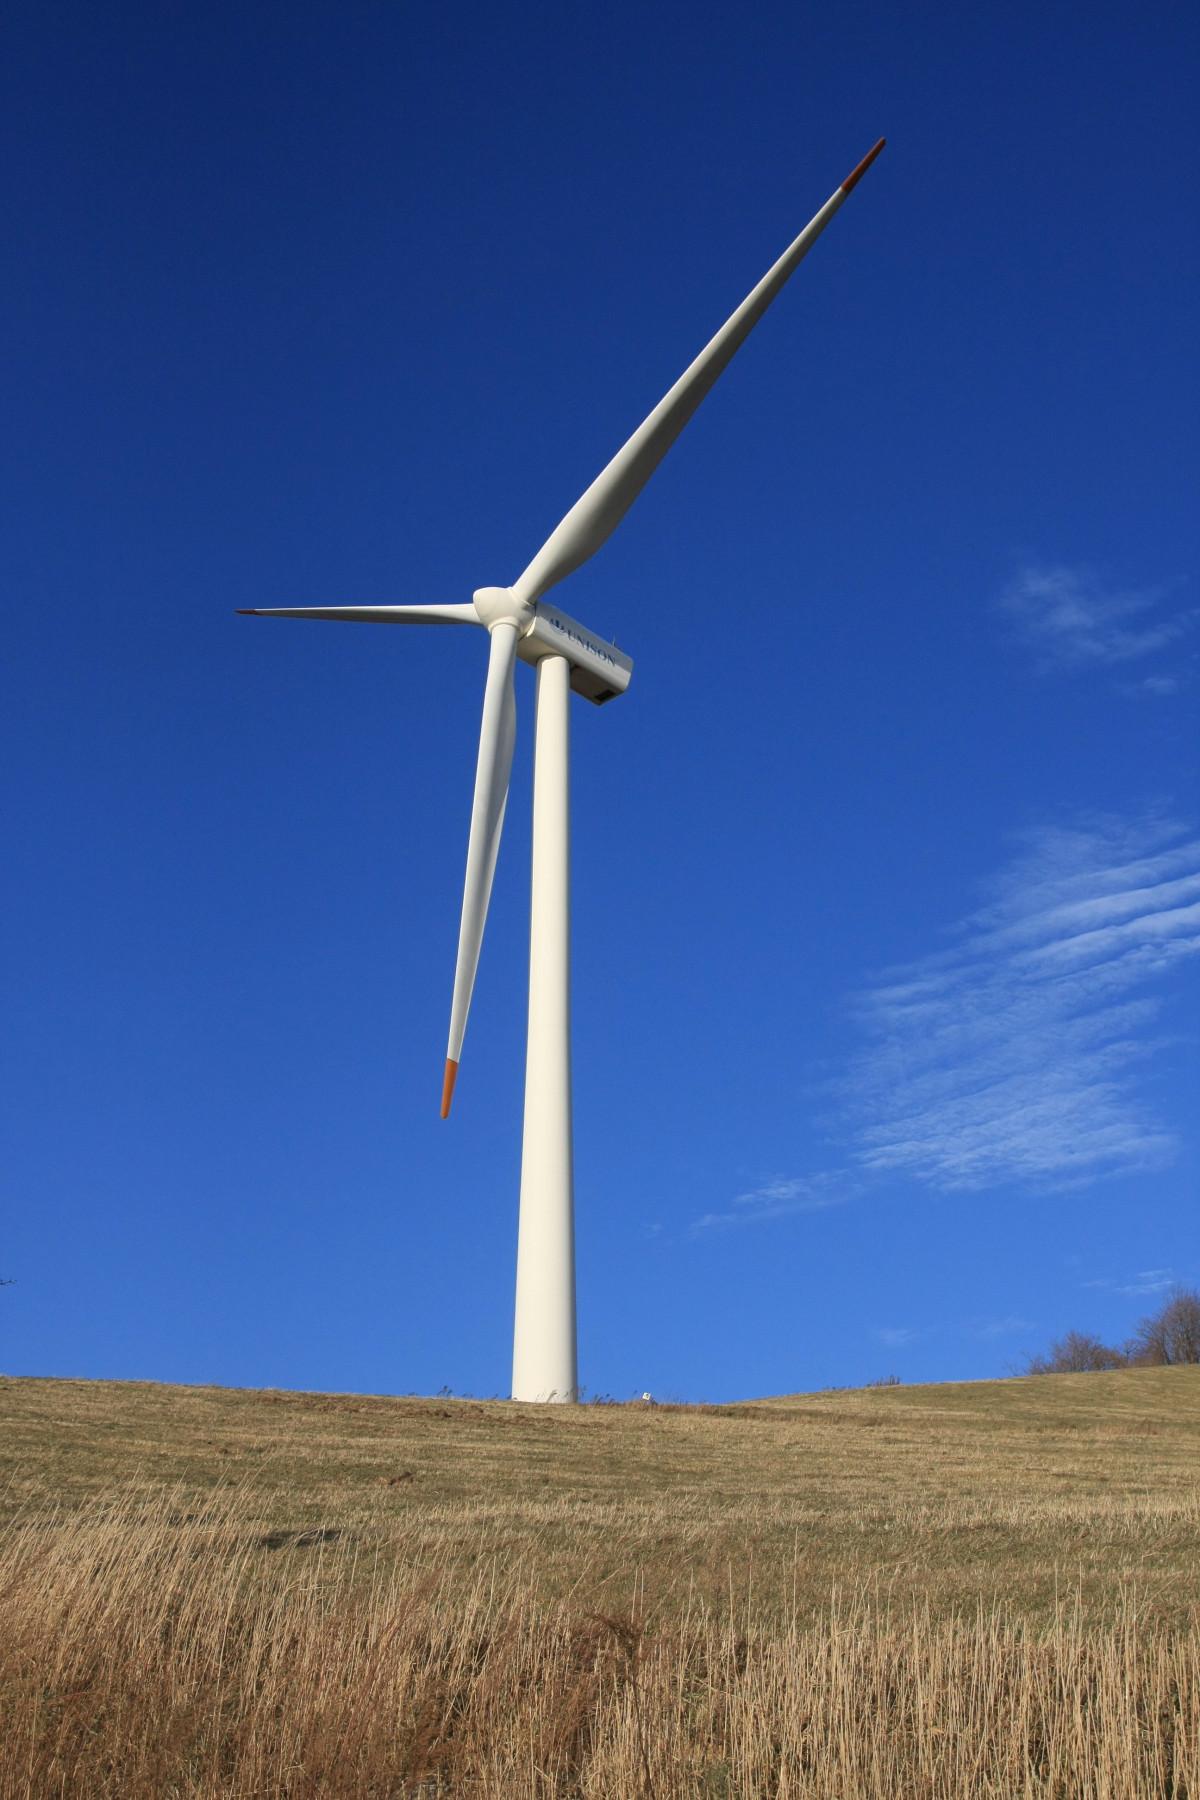 Free Images Windmill Machine Wind Turbine Energy